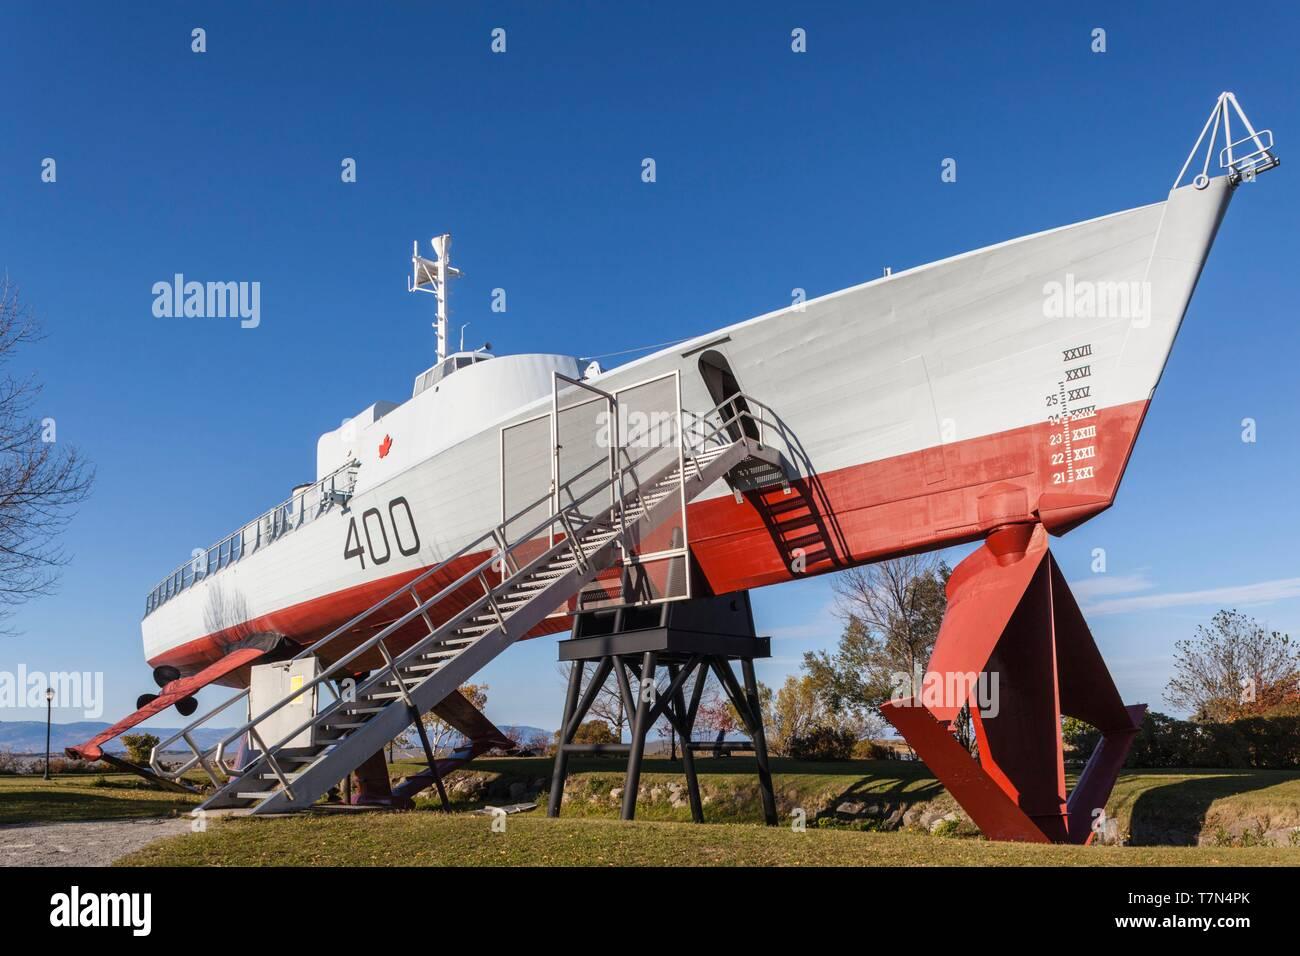 Kanada, Quebec, Chaudiere-Appalaches Region, L'Islet-sur-Mer, HMCS Bras d'Or, experimentelle Tragflügelboot, außerhalb des Maritime Museum Stockbild